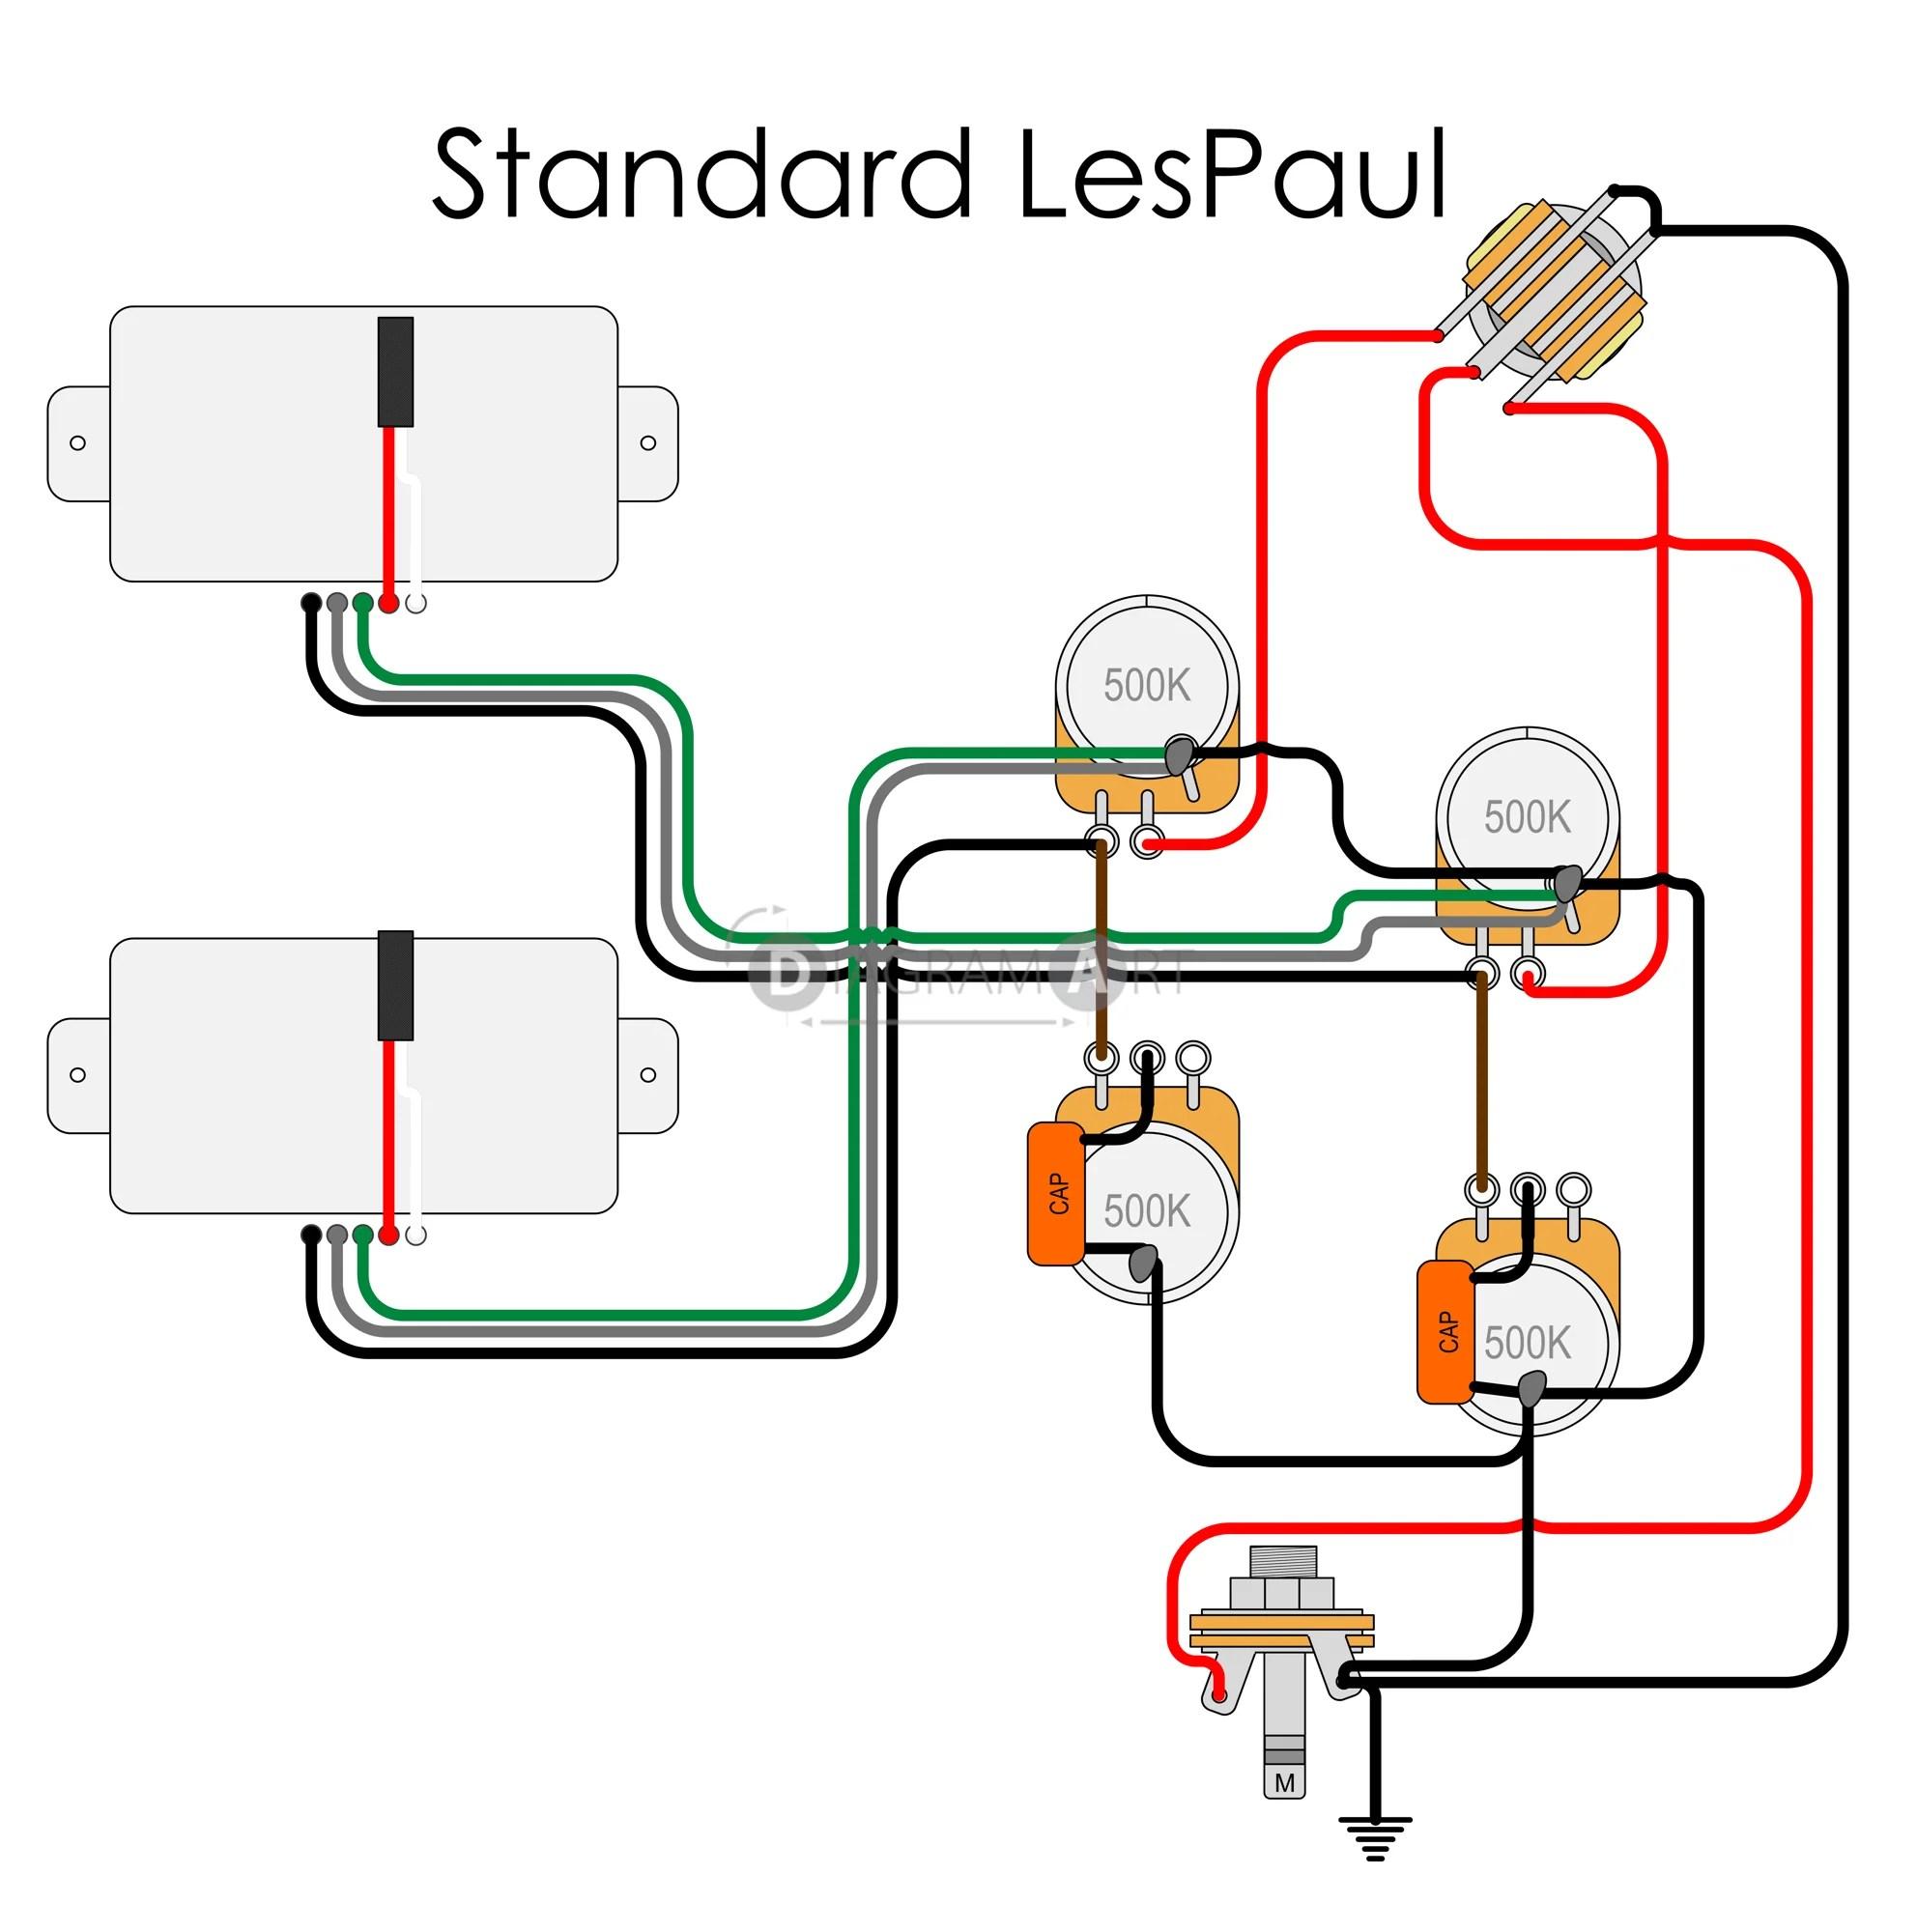 small resolution of electric guitar wiring standard lespaul electric circuit diagramart les paul axcess wiring diagram standard les paul wiring diagram